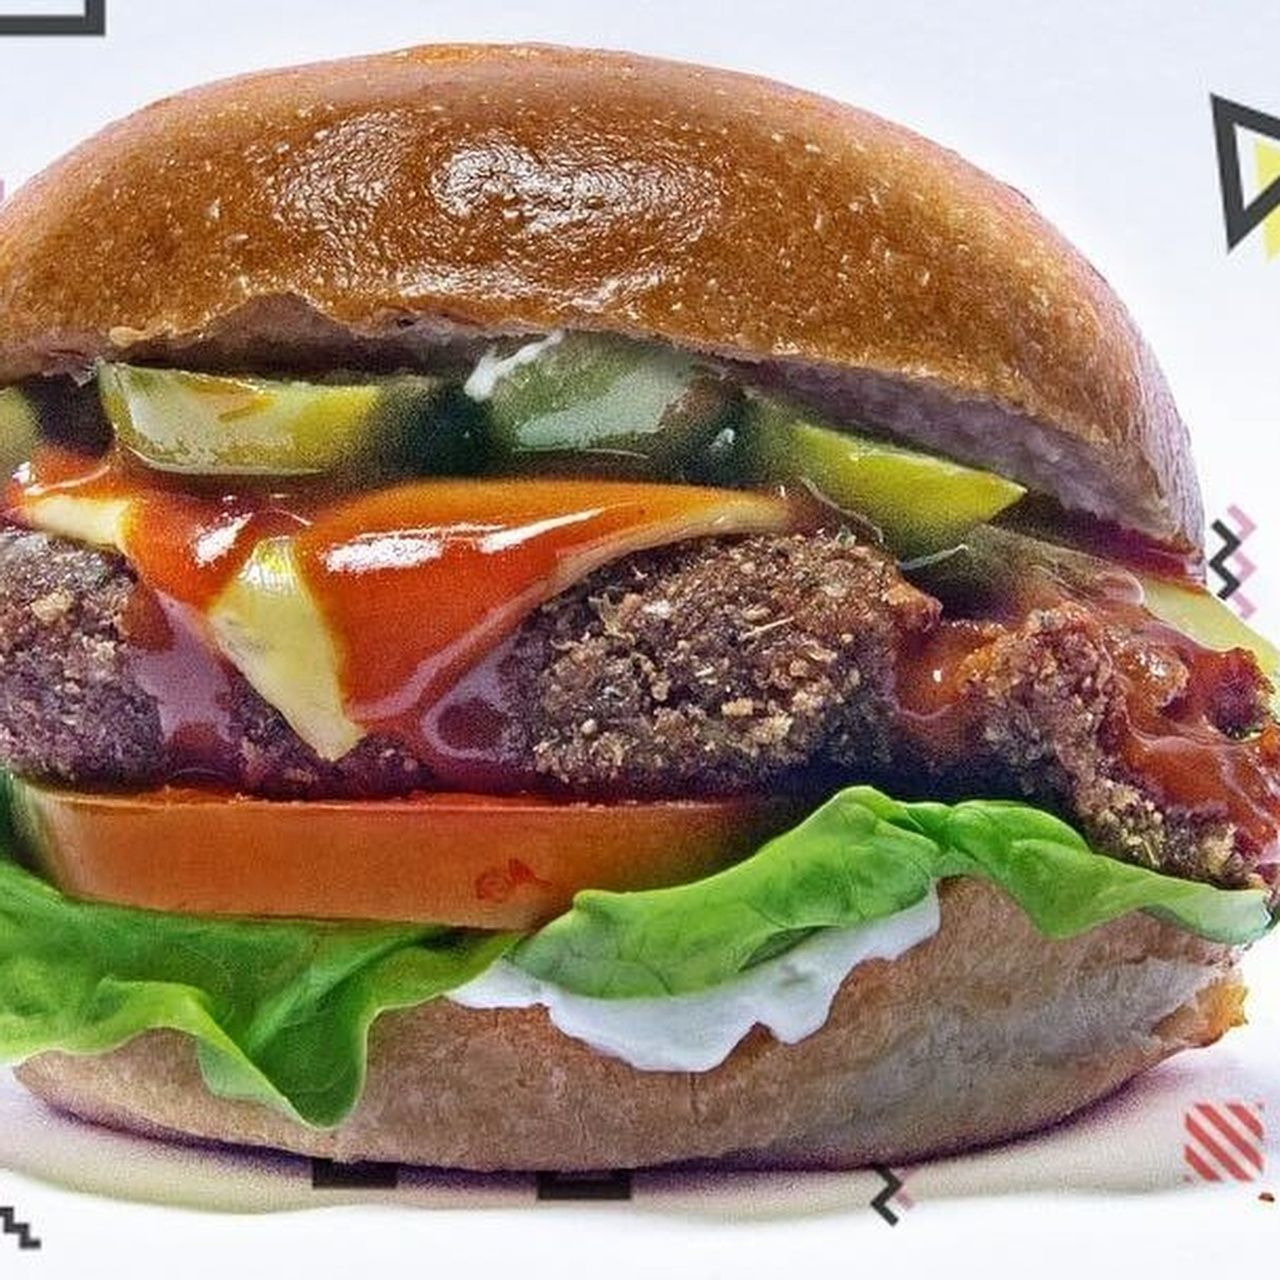 Buy Me Some Peanuts And Vegan Burgers Yankee Stadium Now Offers Black Bean Burgers Bean Burger Black Bean Burgers Whole Food Recipes